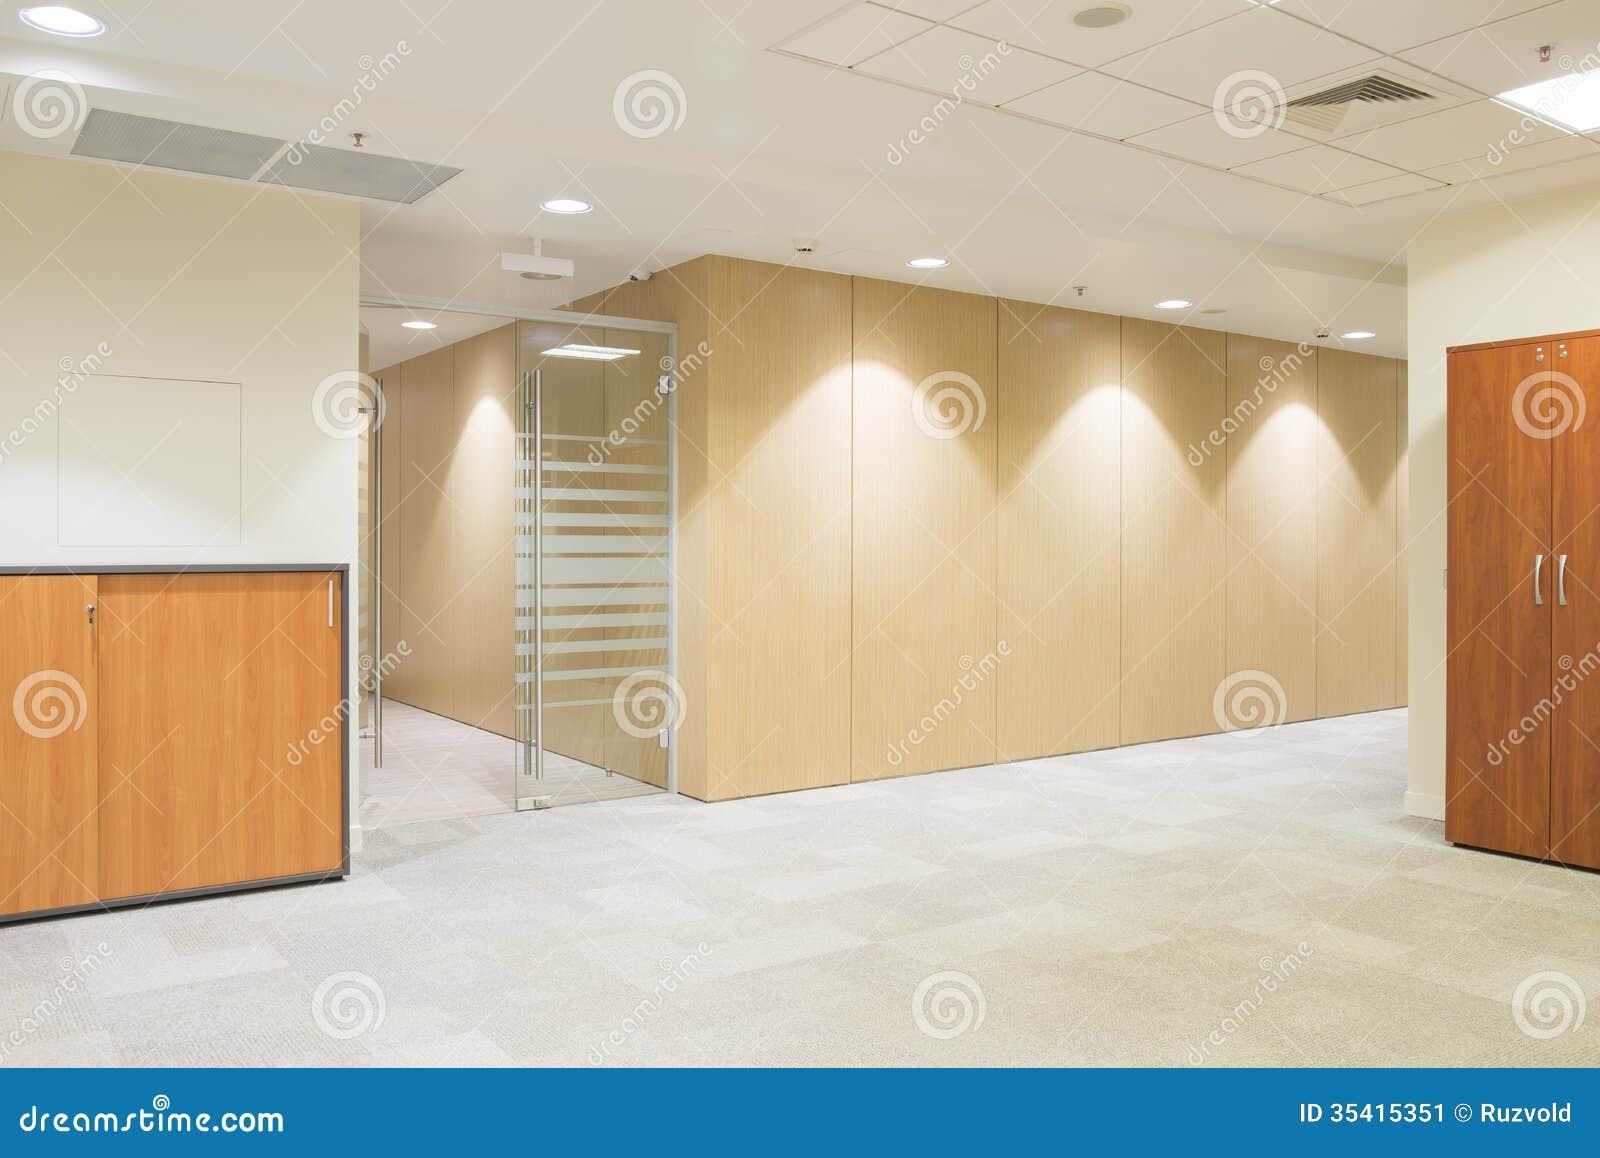 Office interior stock image. Image of dorm, apartment - 35415351